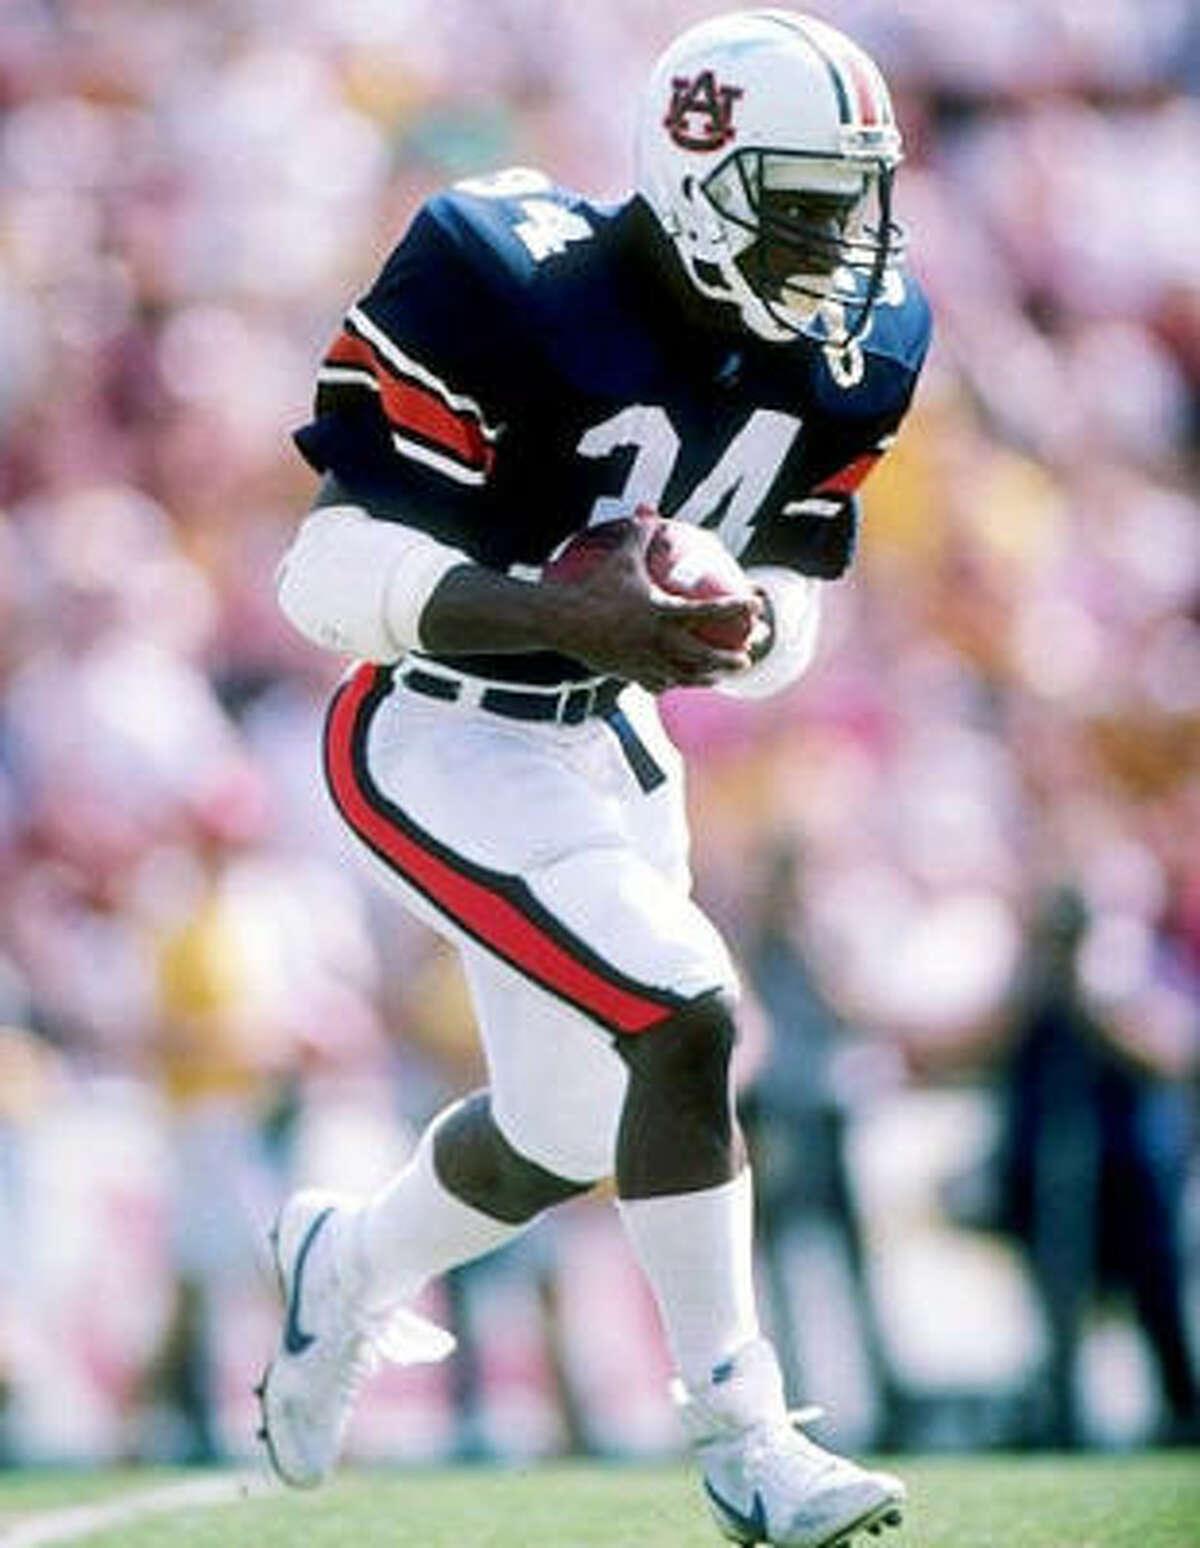 1986 — Bo Jackson, Tampa Bay, RB, Auburn